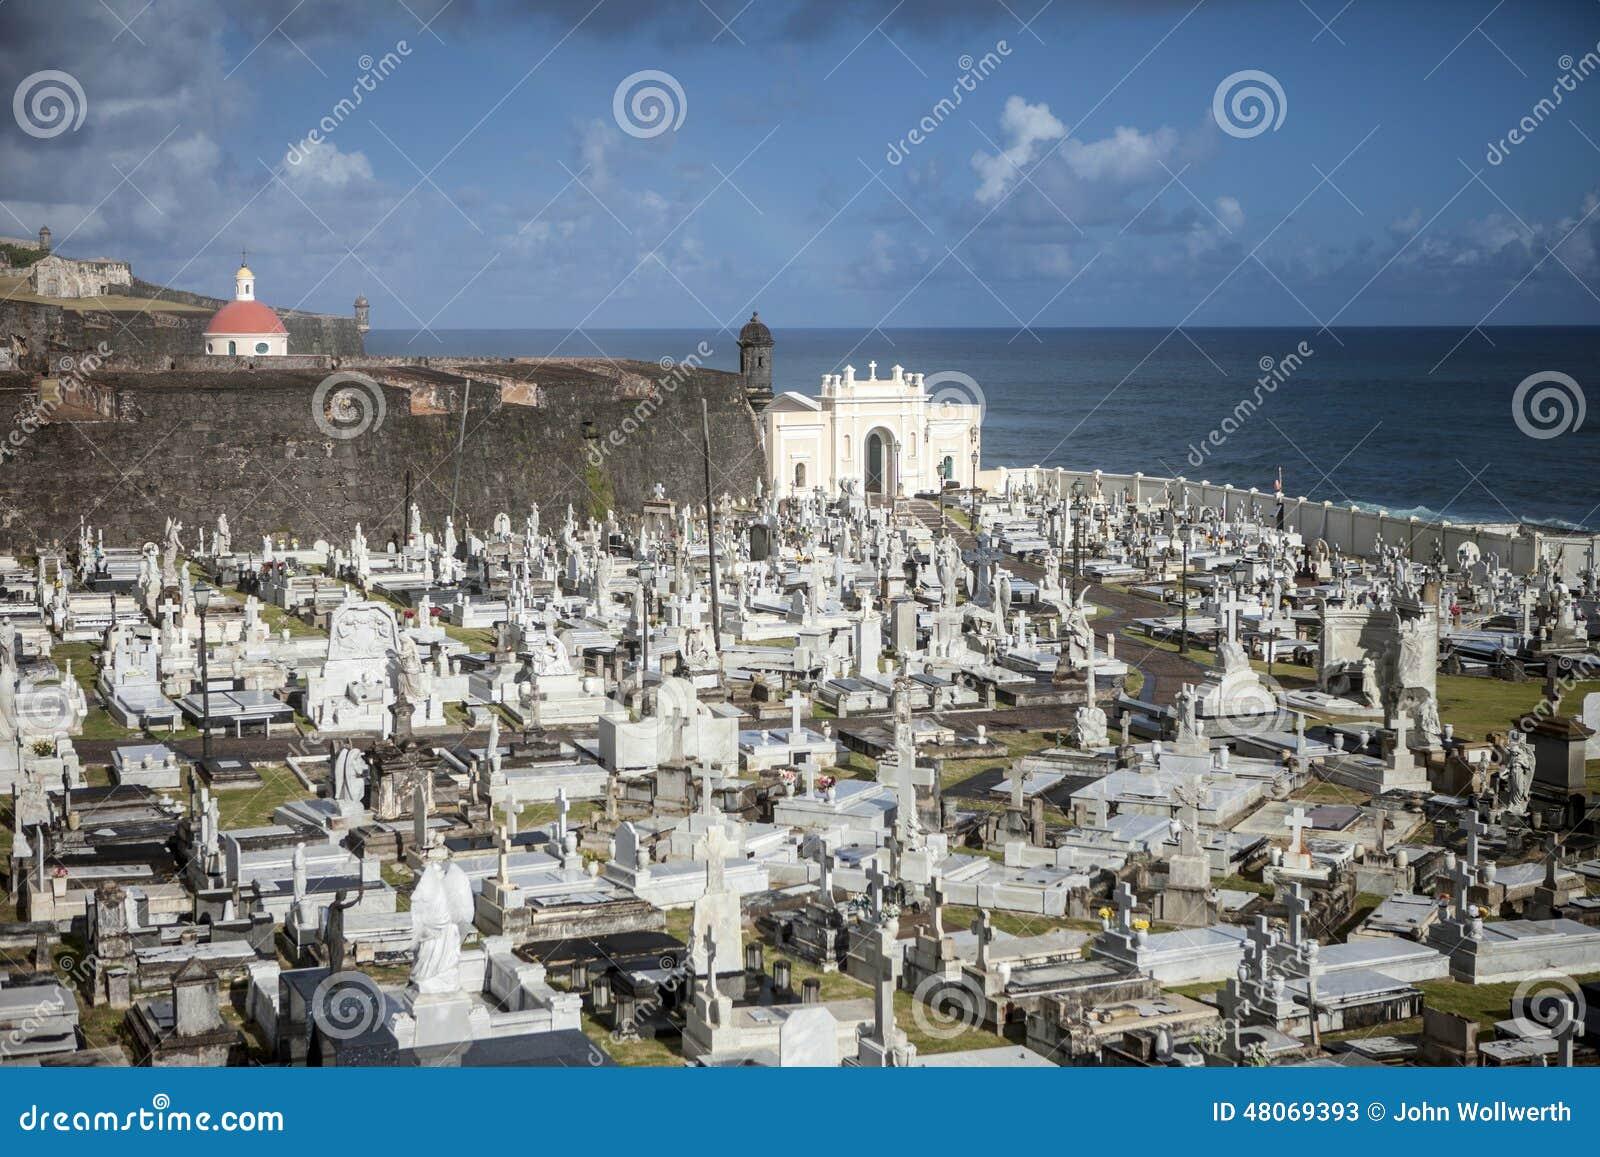 Cemetery in Puerto Rico .. San Juan 58